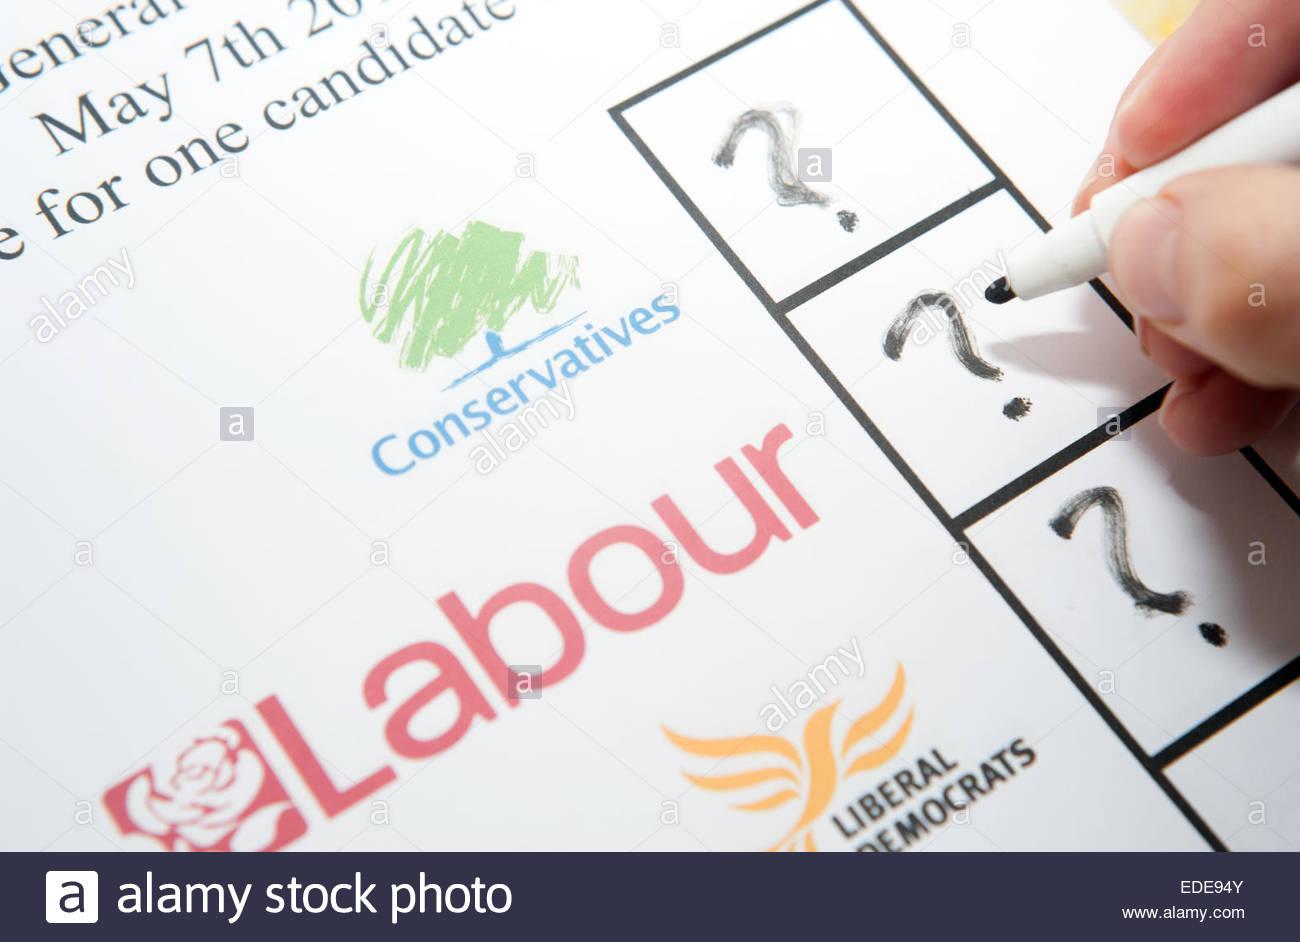 UK Elections ballot paper facsimile. Floating voter / undecided. - Stock Image